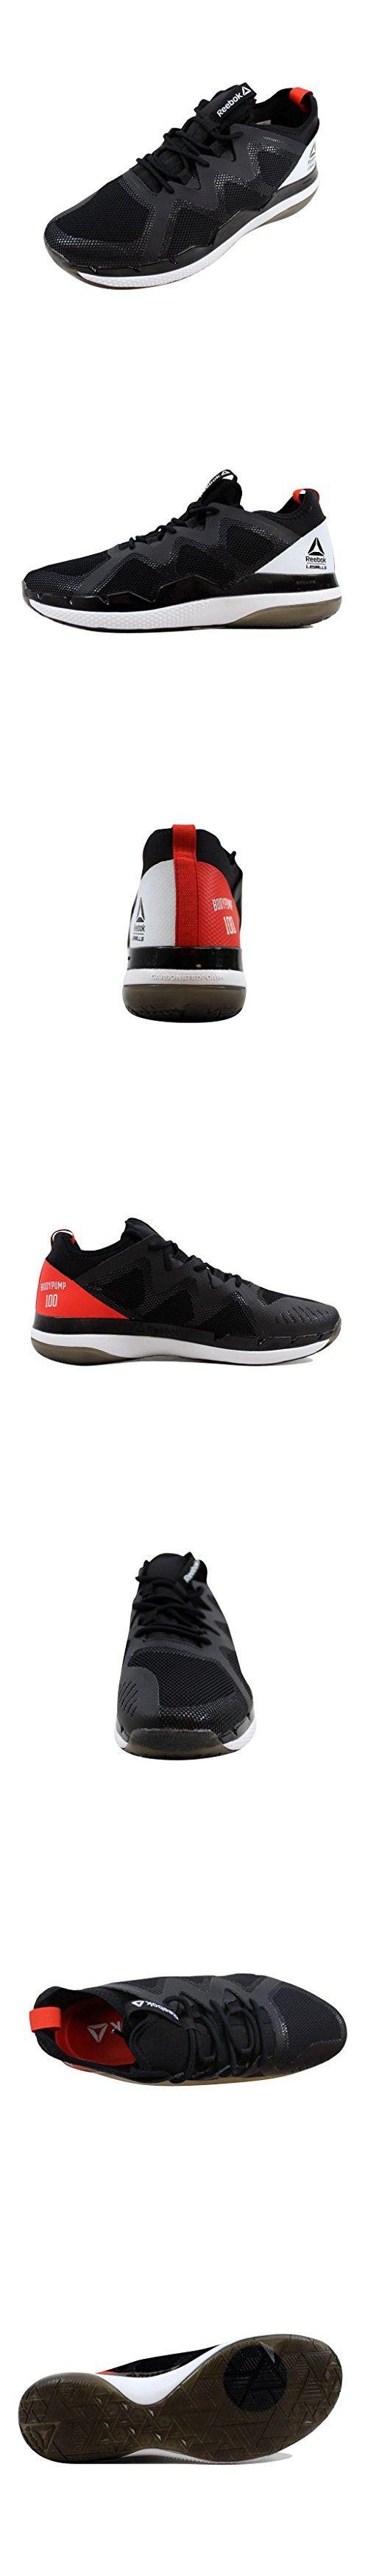 e78f4dcf1ba35 Reebok BS7278 Men's LES Mills Bodypump 100 Ultra 4.0 Shoe, Black ...